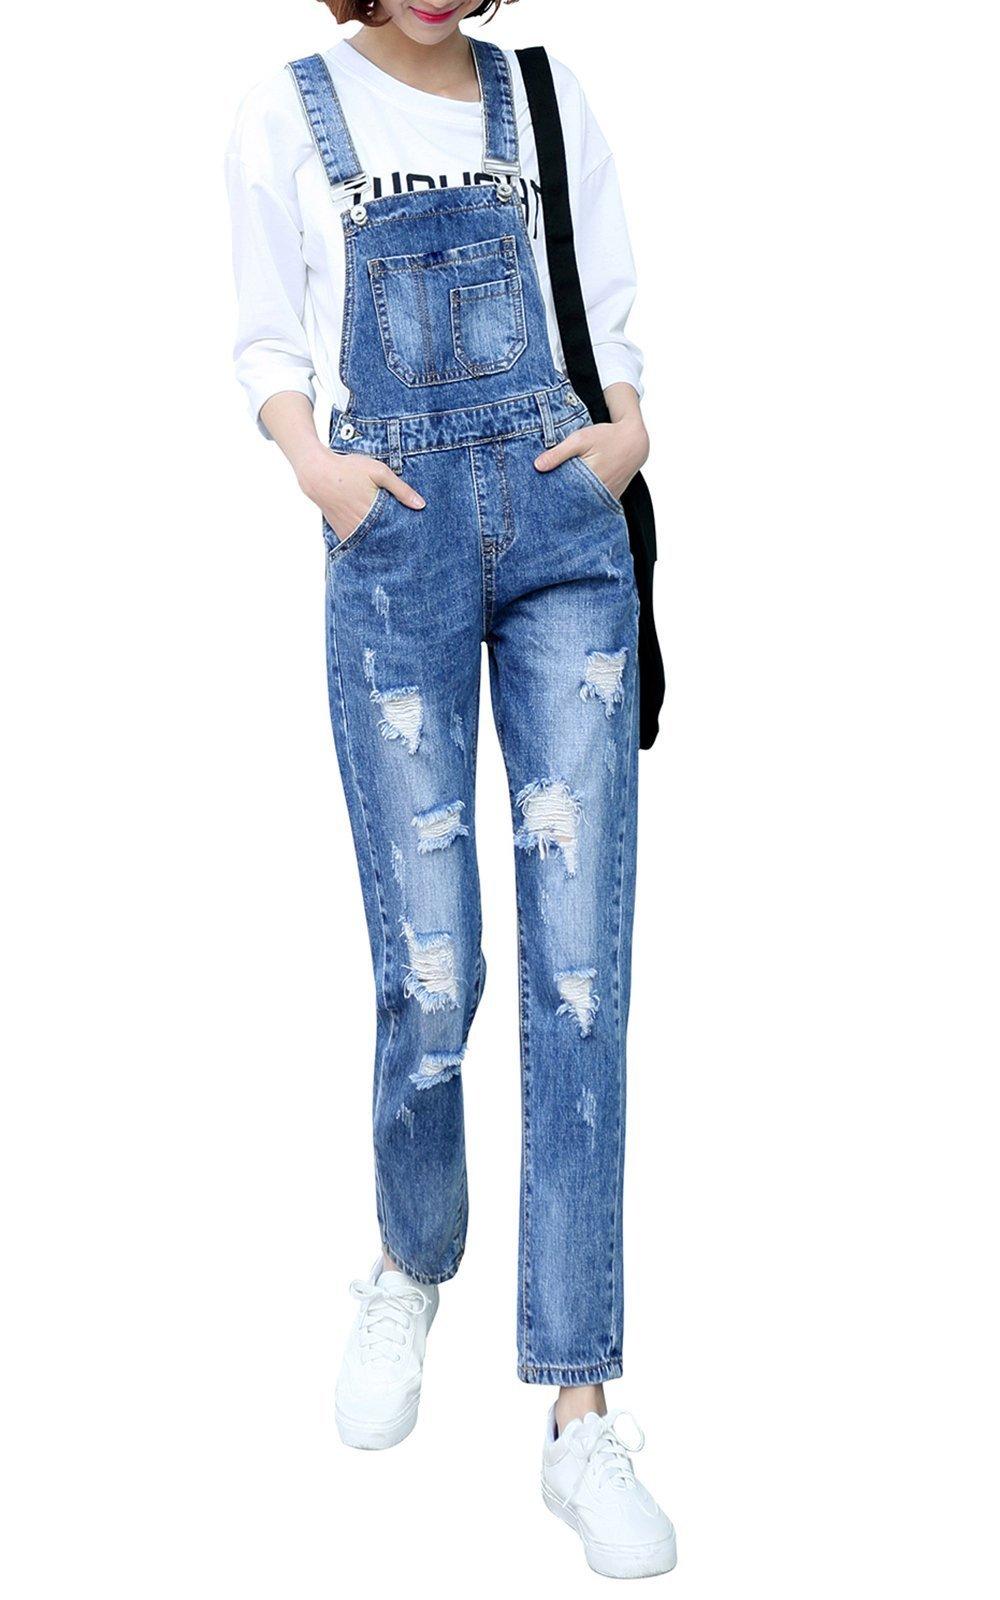 Women's Adjustable Strap Ripped Distressed Original Denim Overalls (M, Denim Blue)